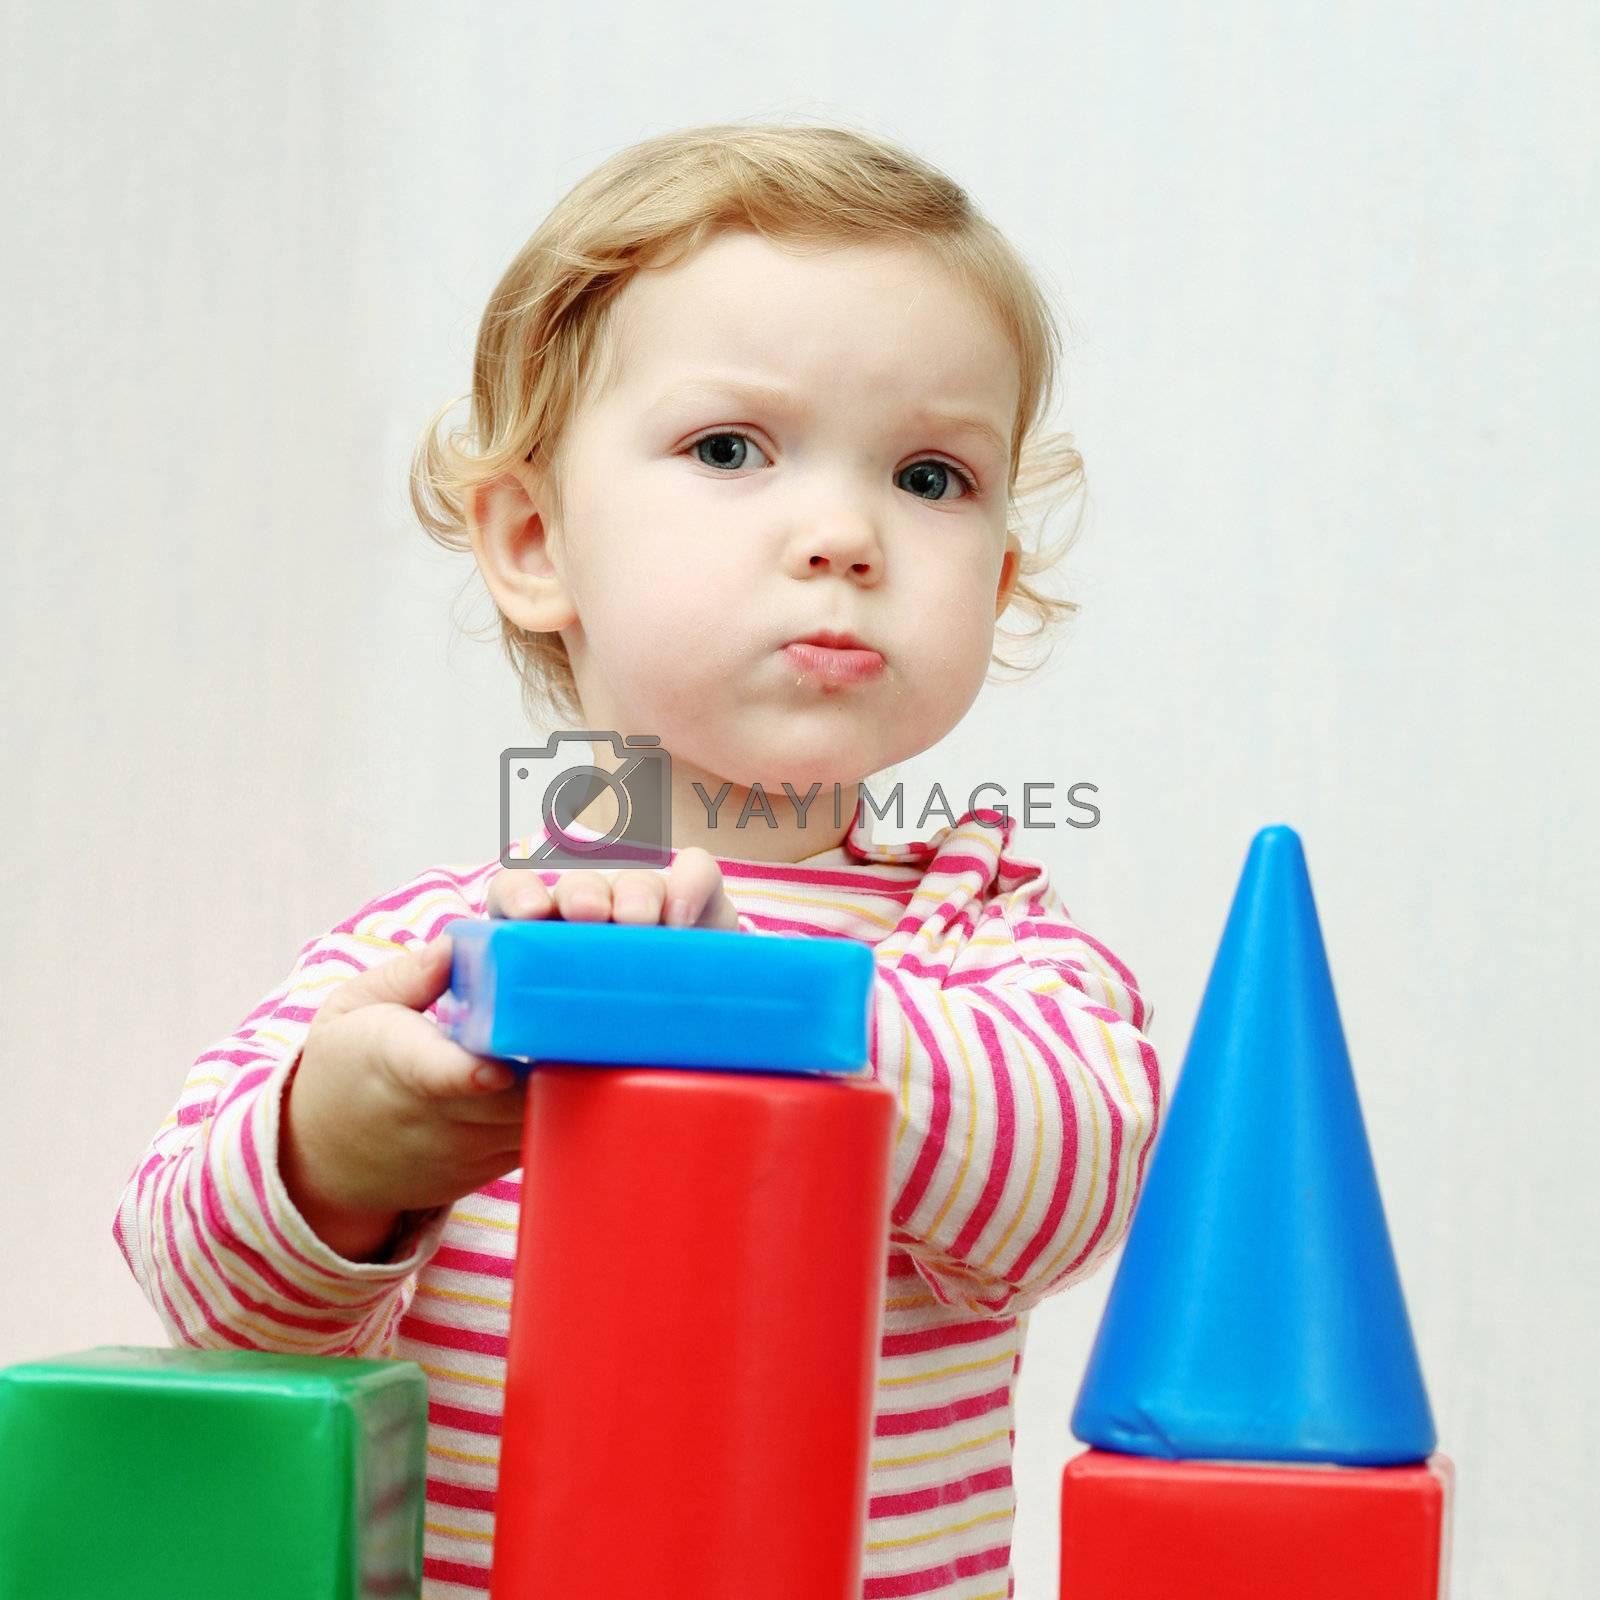 An image of a nice playing baby girl